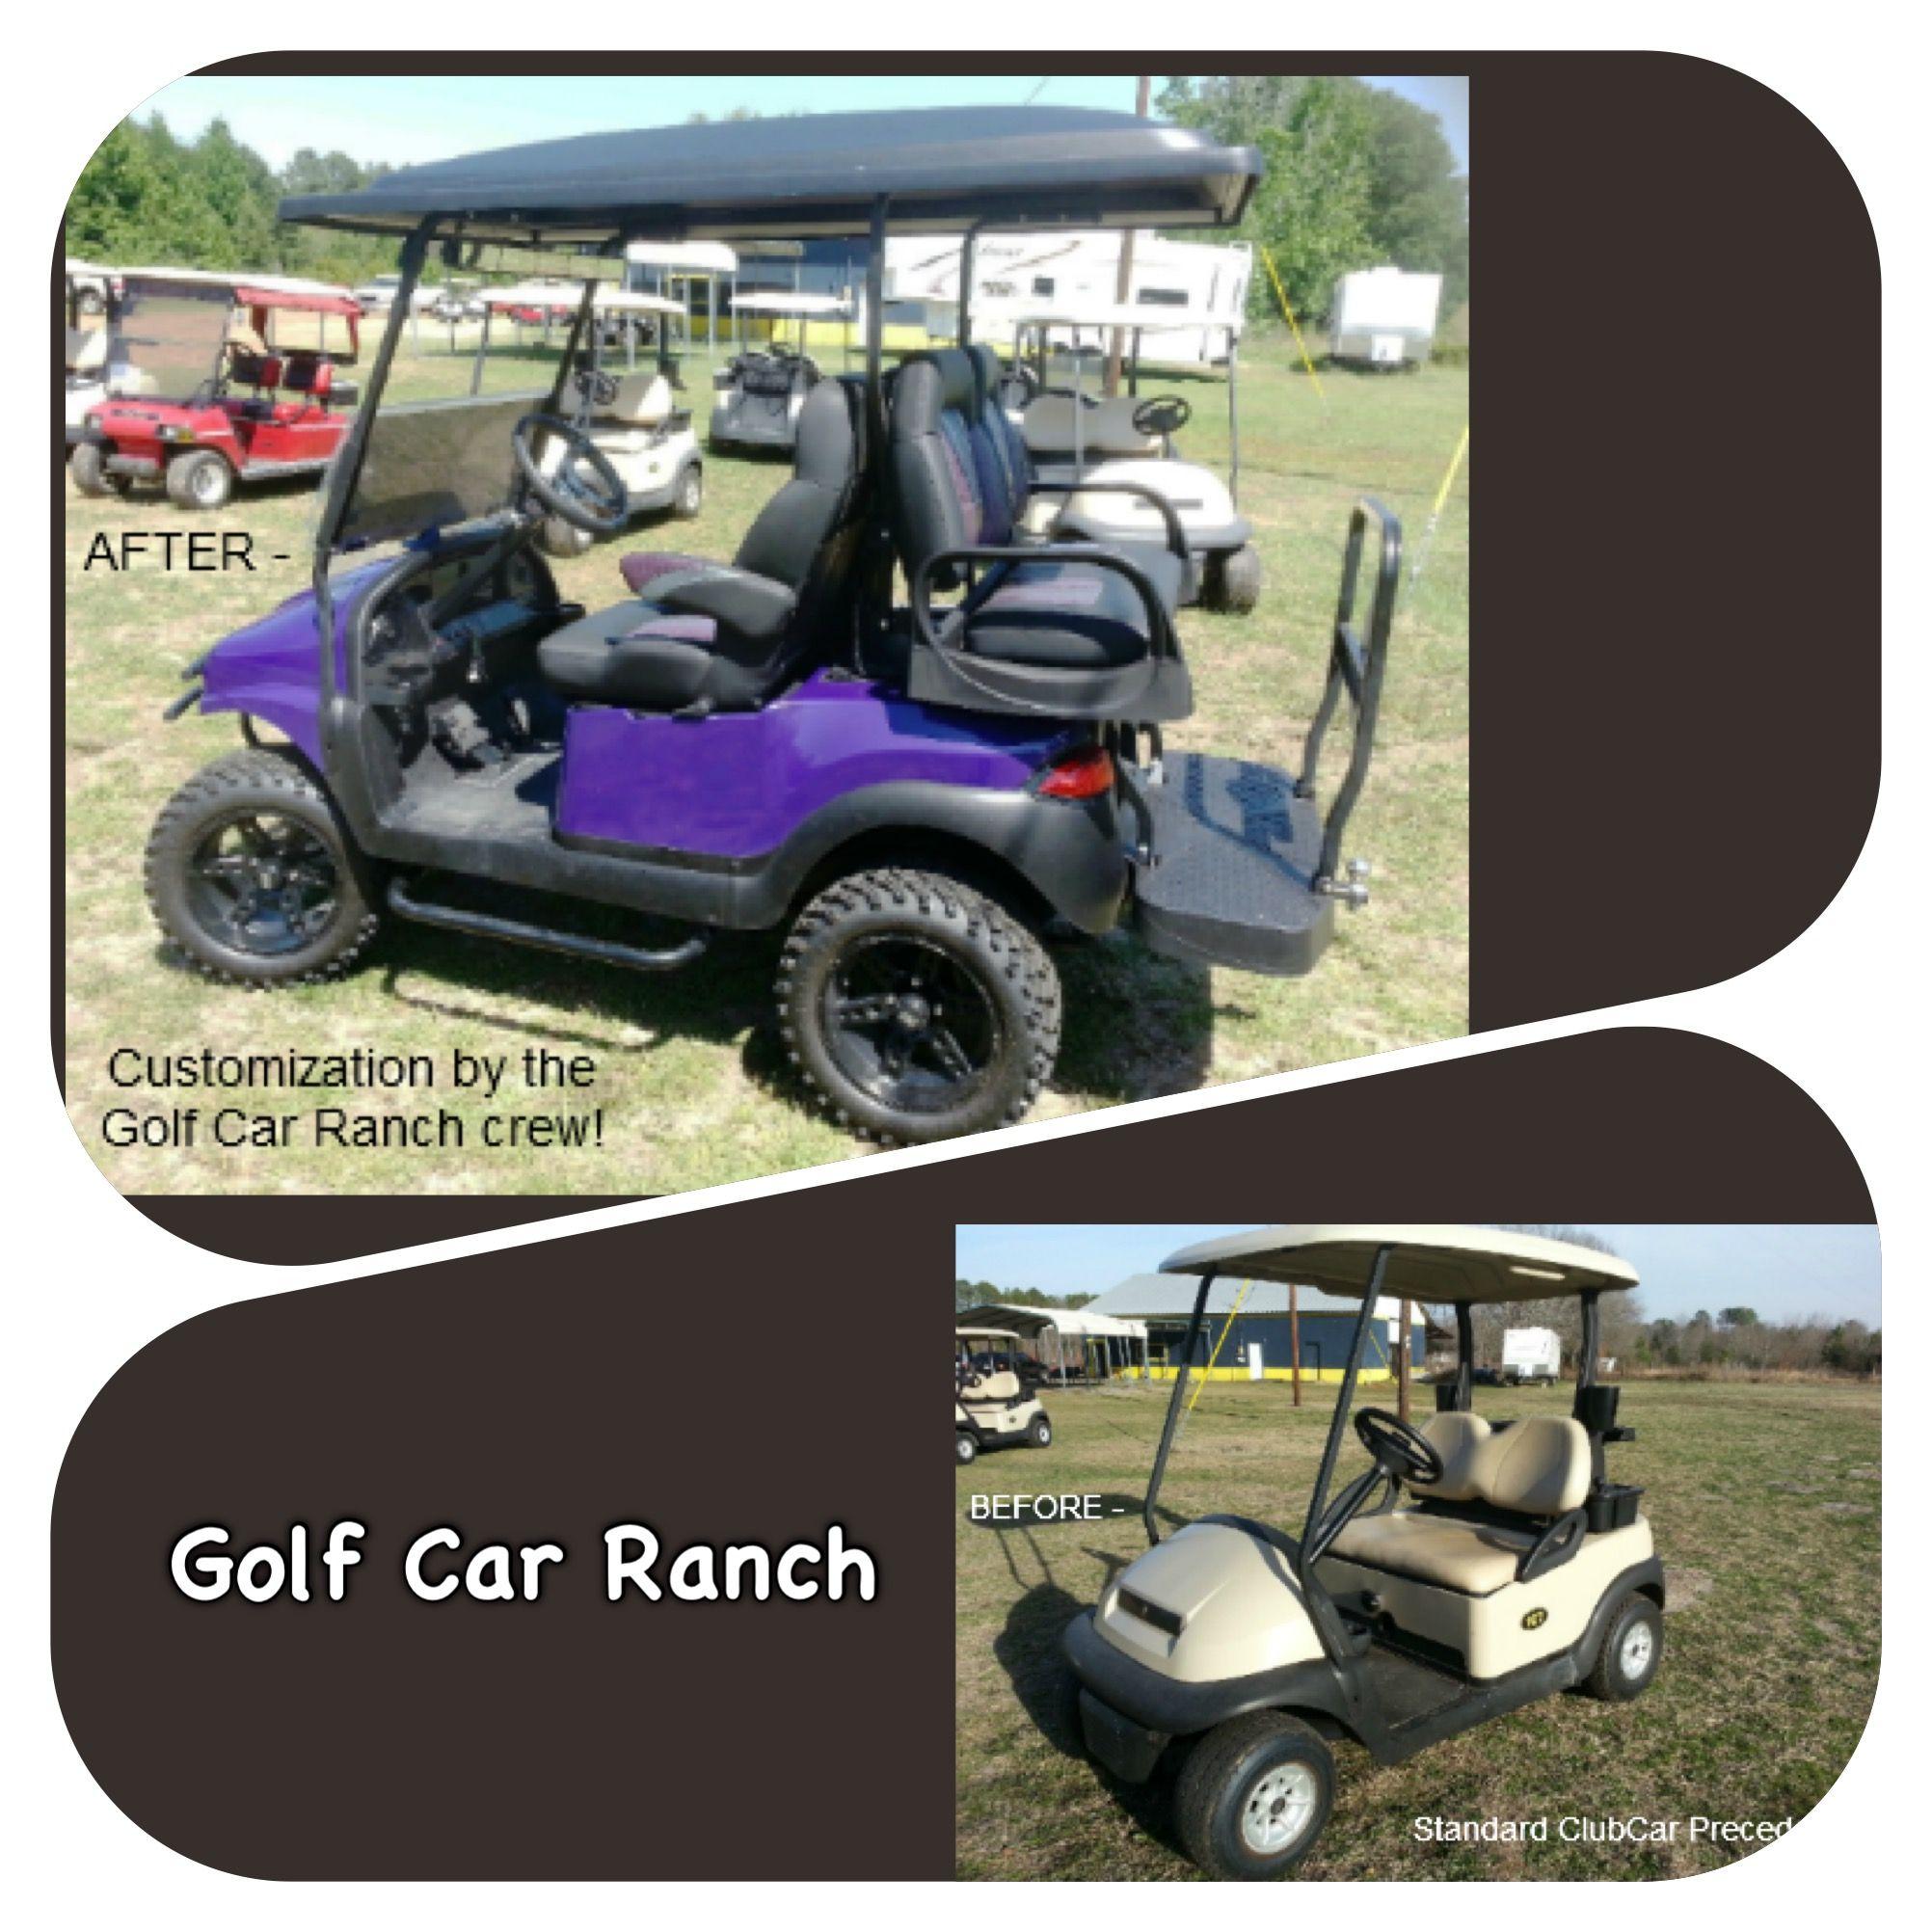 Purple Phantom Custom Car With Max 5 Seats Customized By The Golf Car Ranch Crew Golf Car Custom Golf Golf Carts